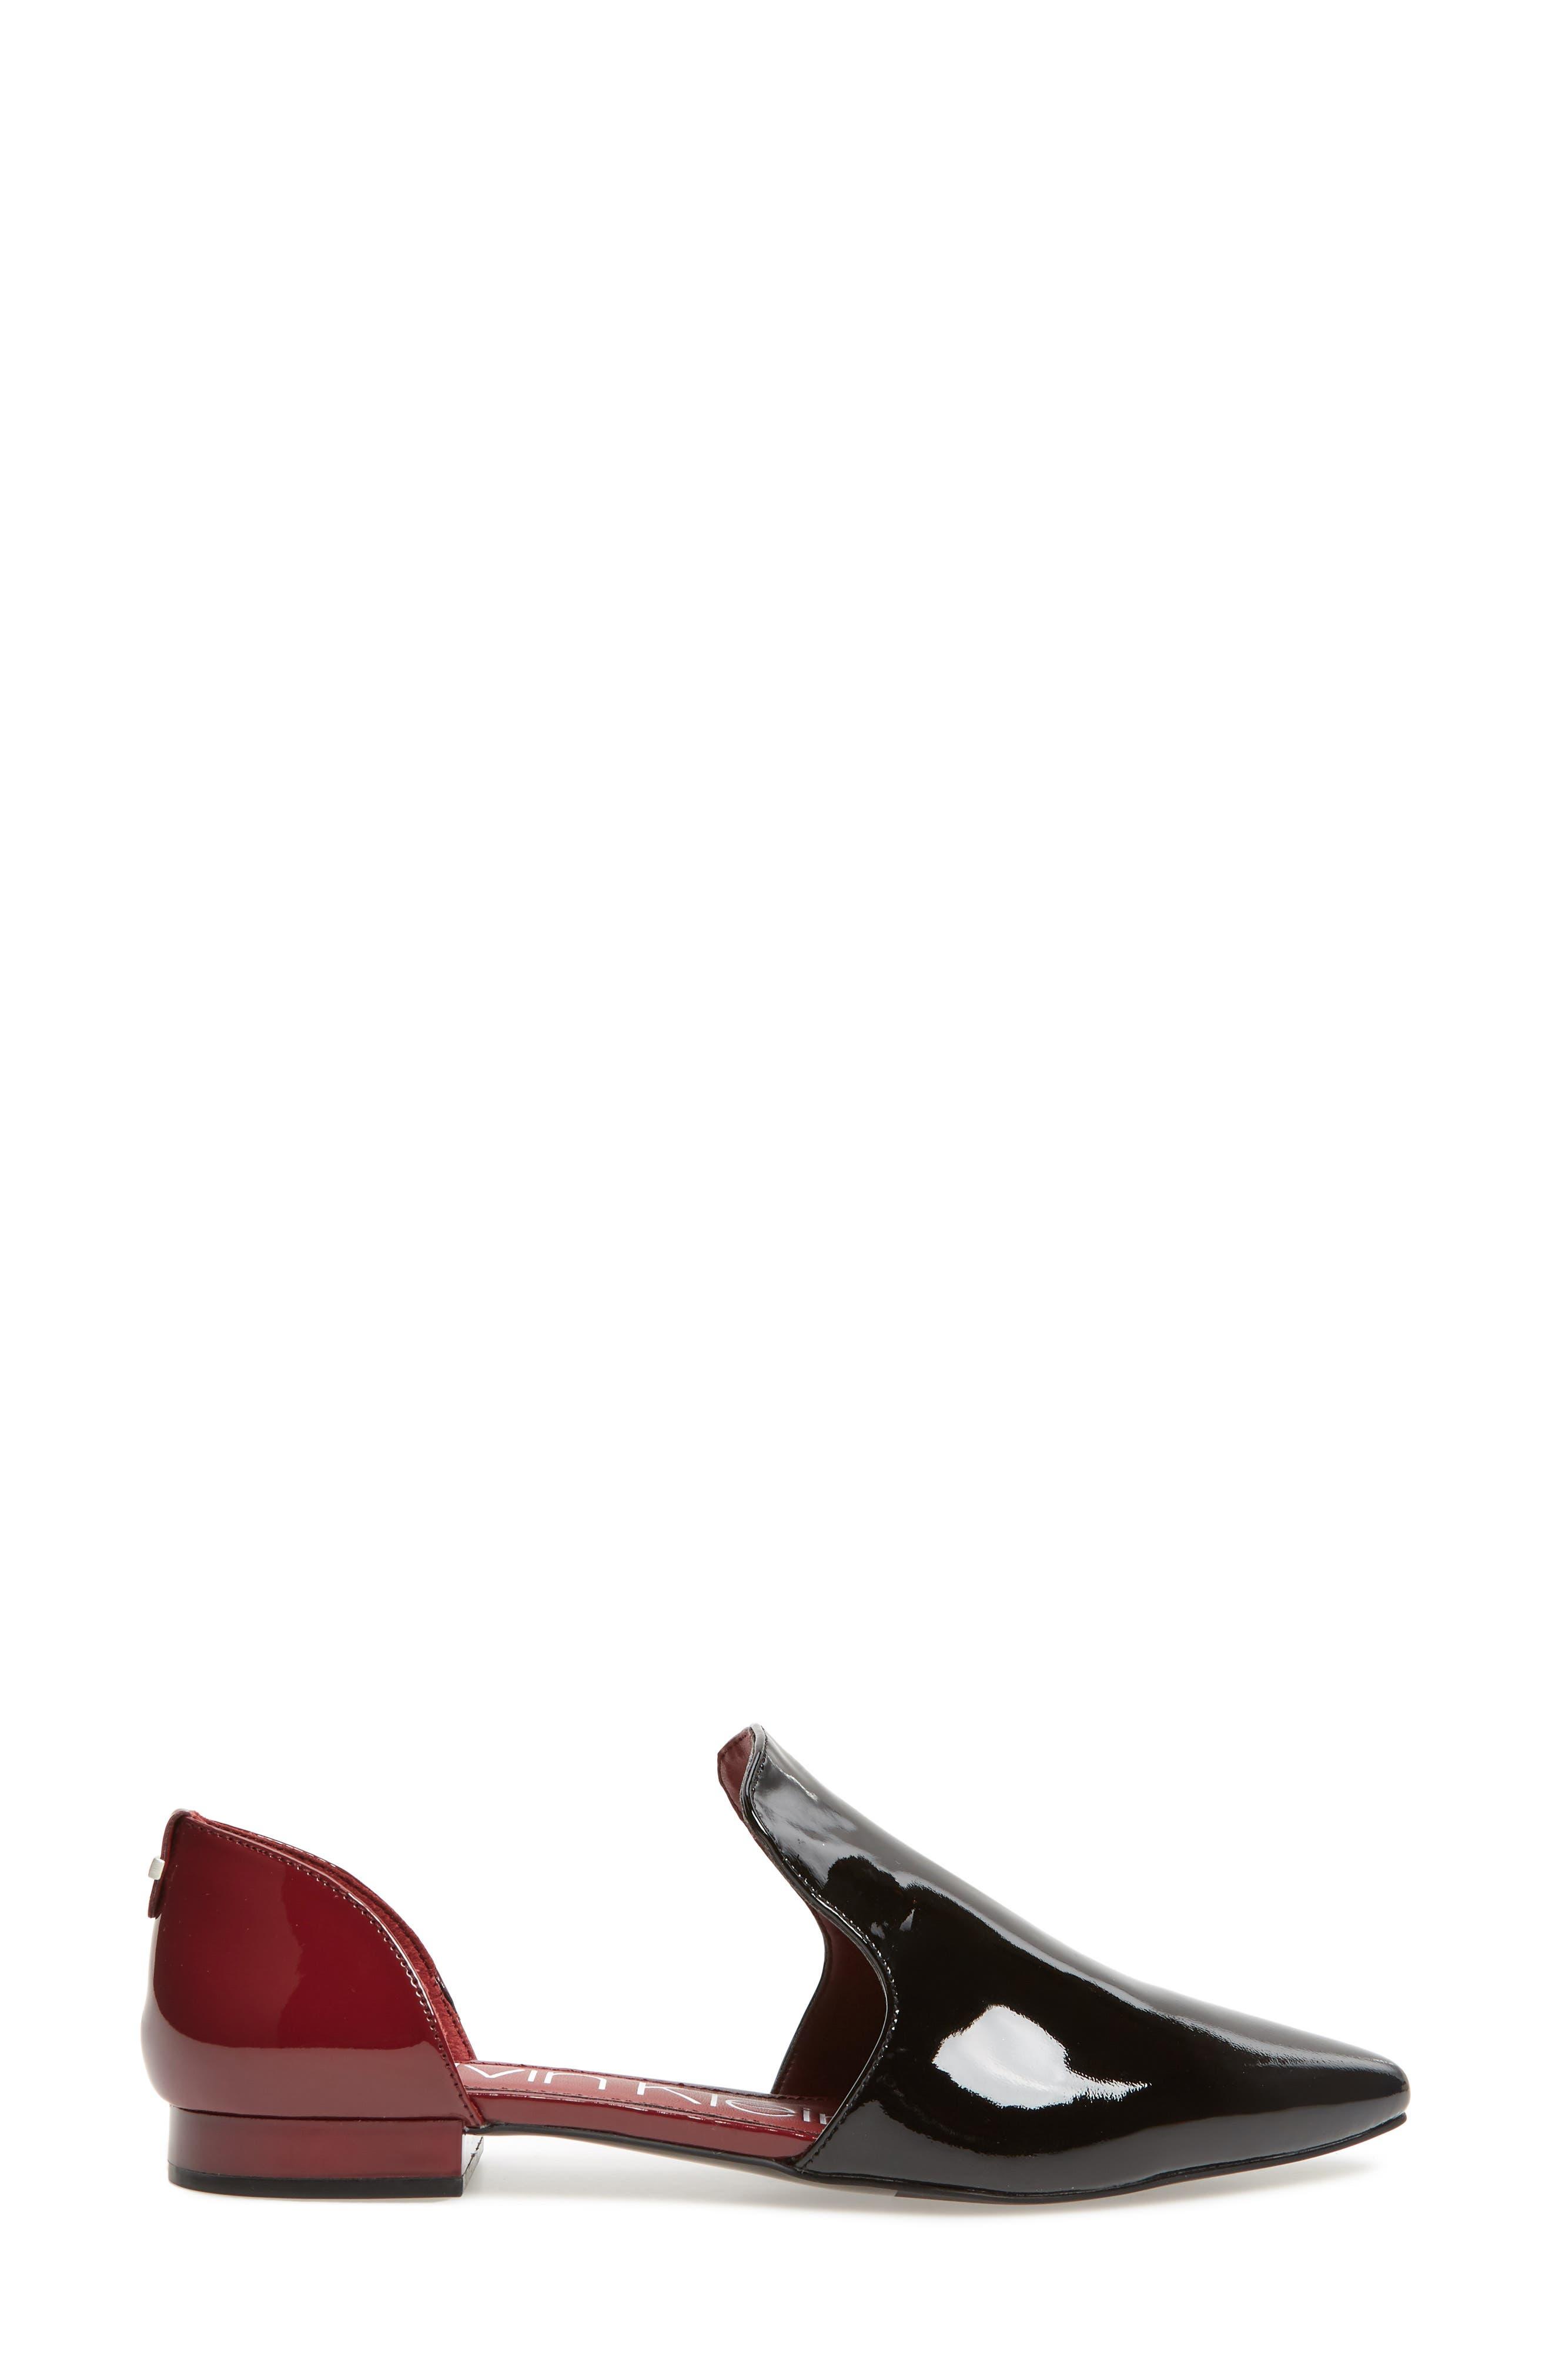 Edona Loafer Flat,                             Alternate thumbnail 3, color,                             BLACK/ RED ROCK PATENT